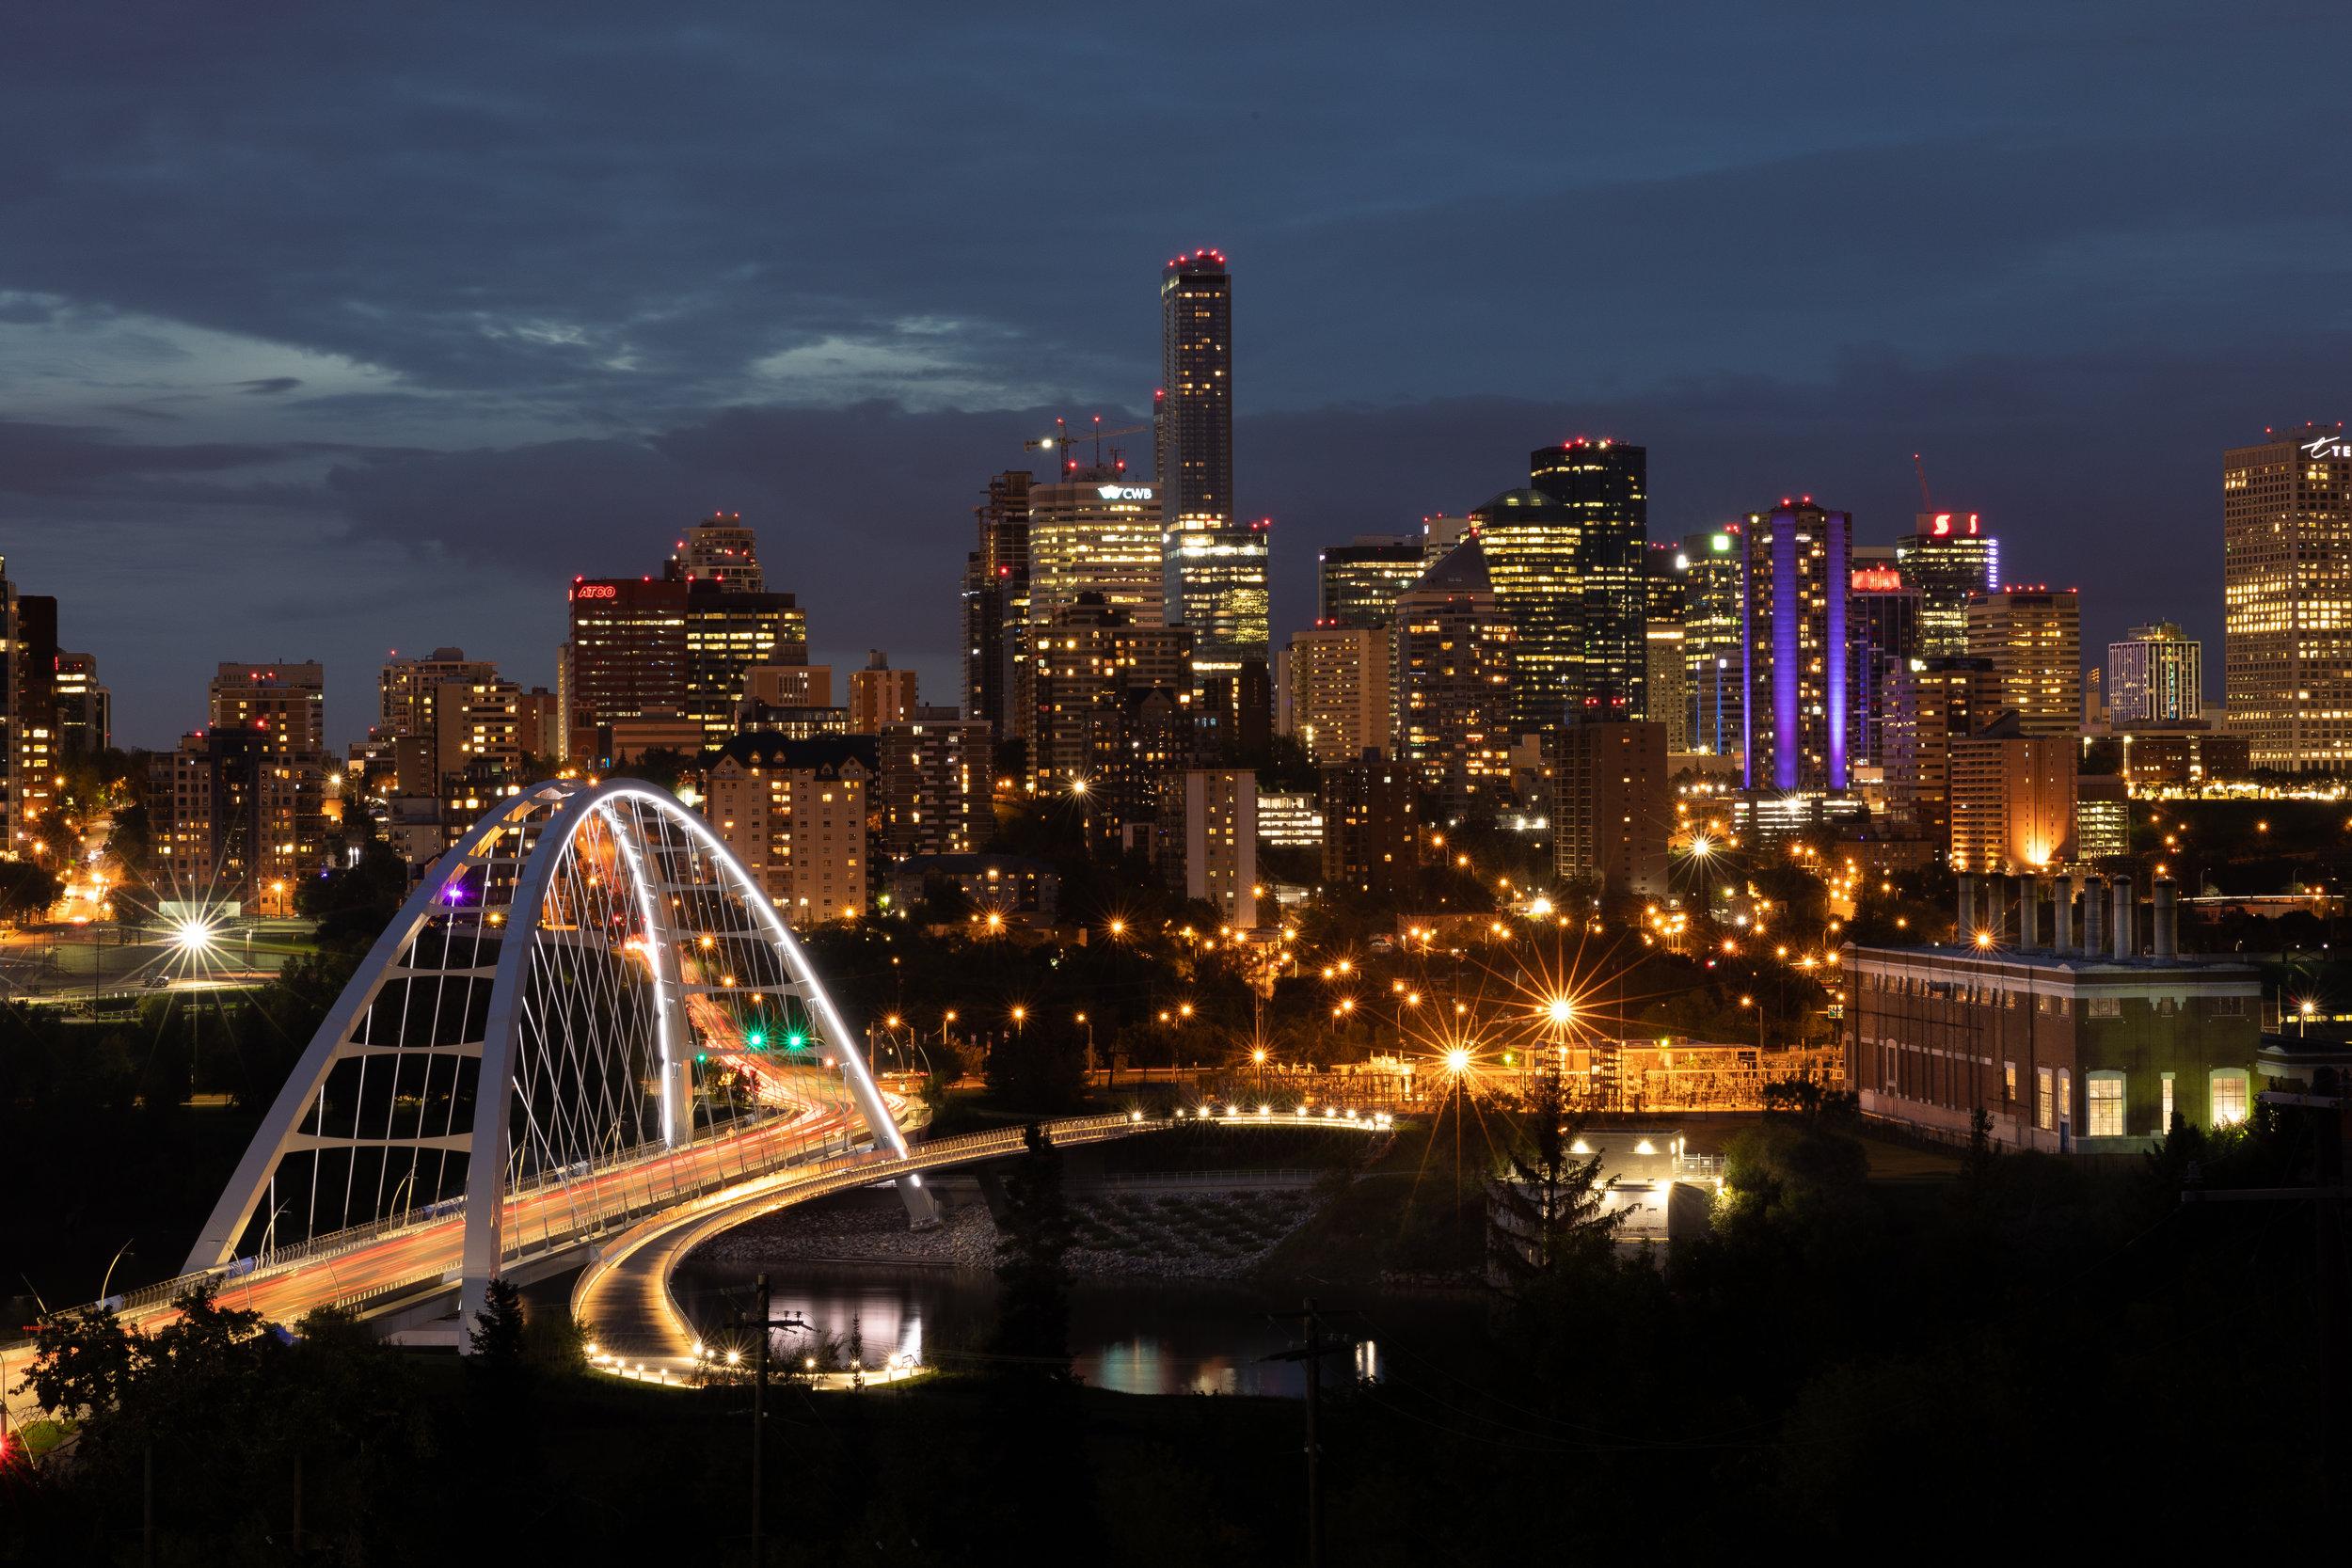 Sunset in Edmonton, Alberta, Canada